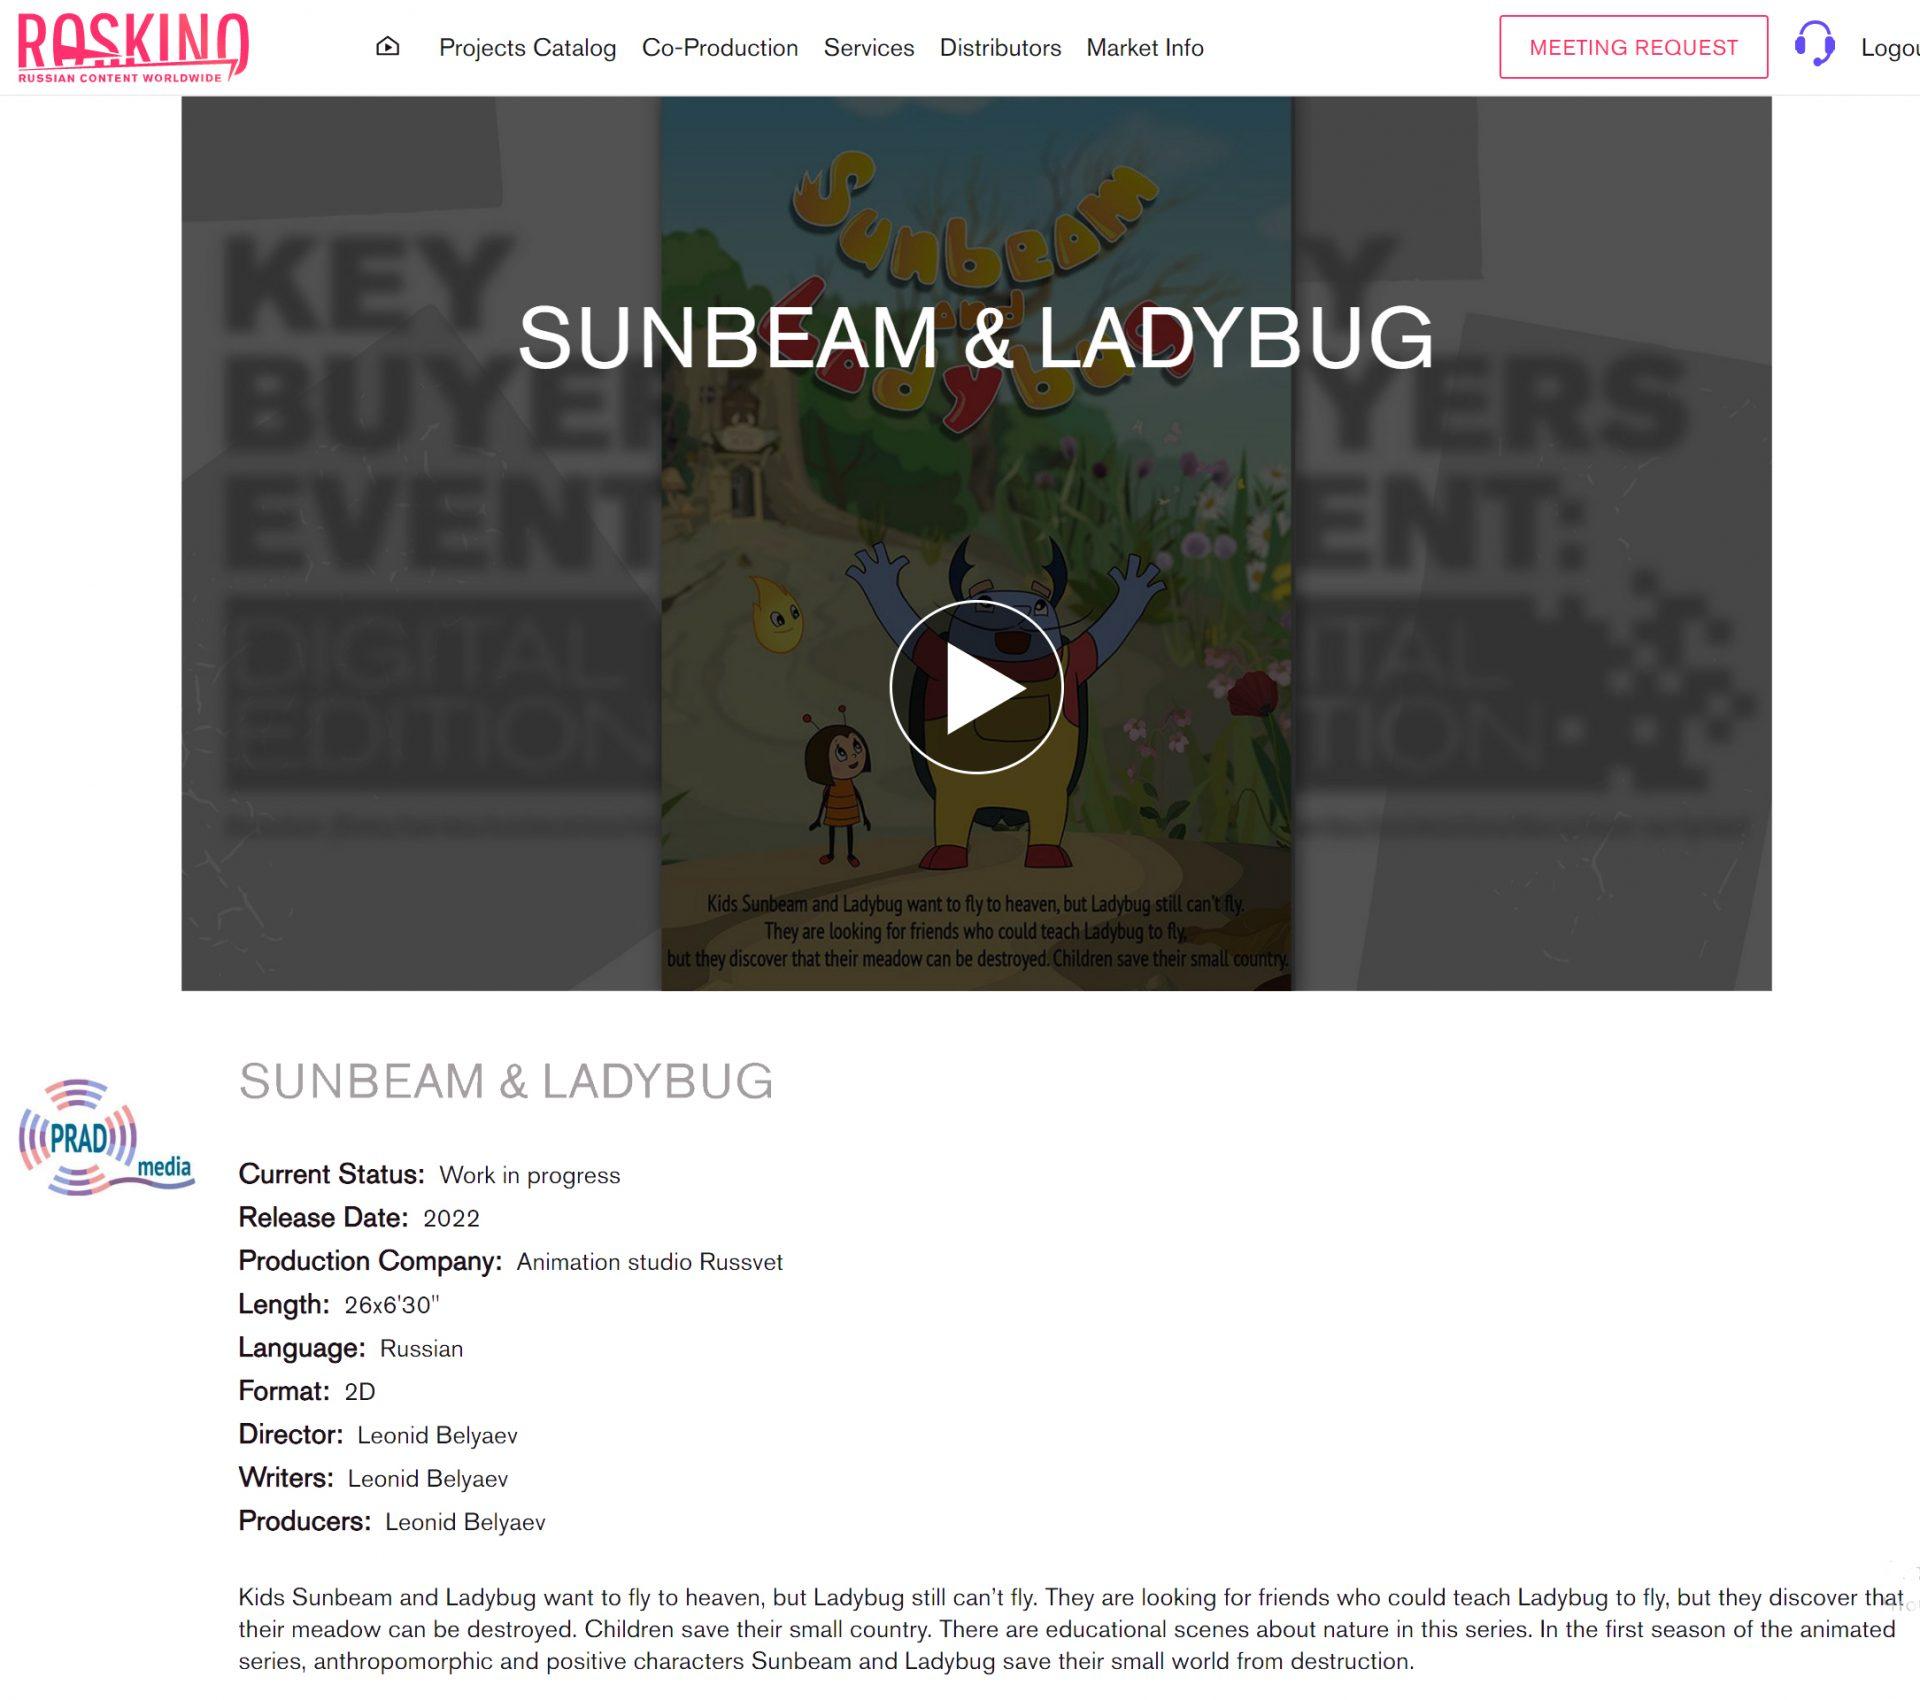 Лучик и Букашечка, каталог, анимационный сериал, Sunbeam and Ladybag, KBE, Animated series, catalog